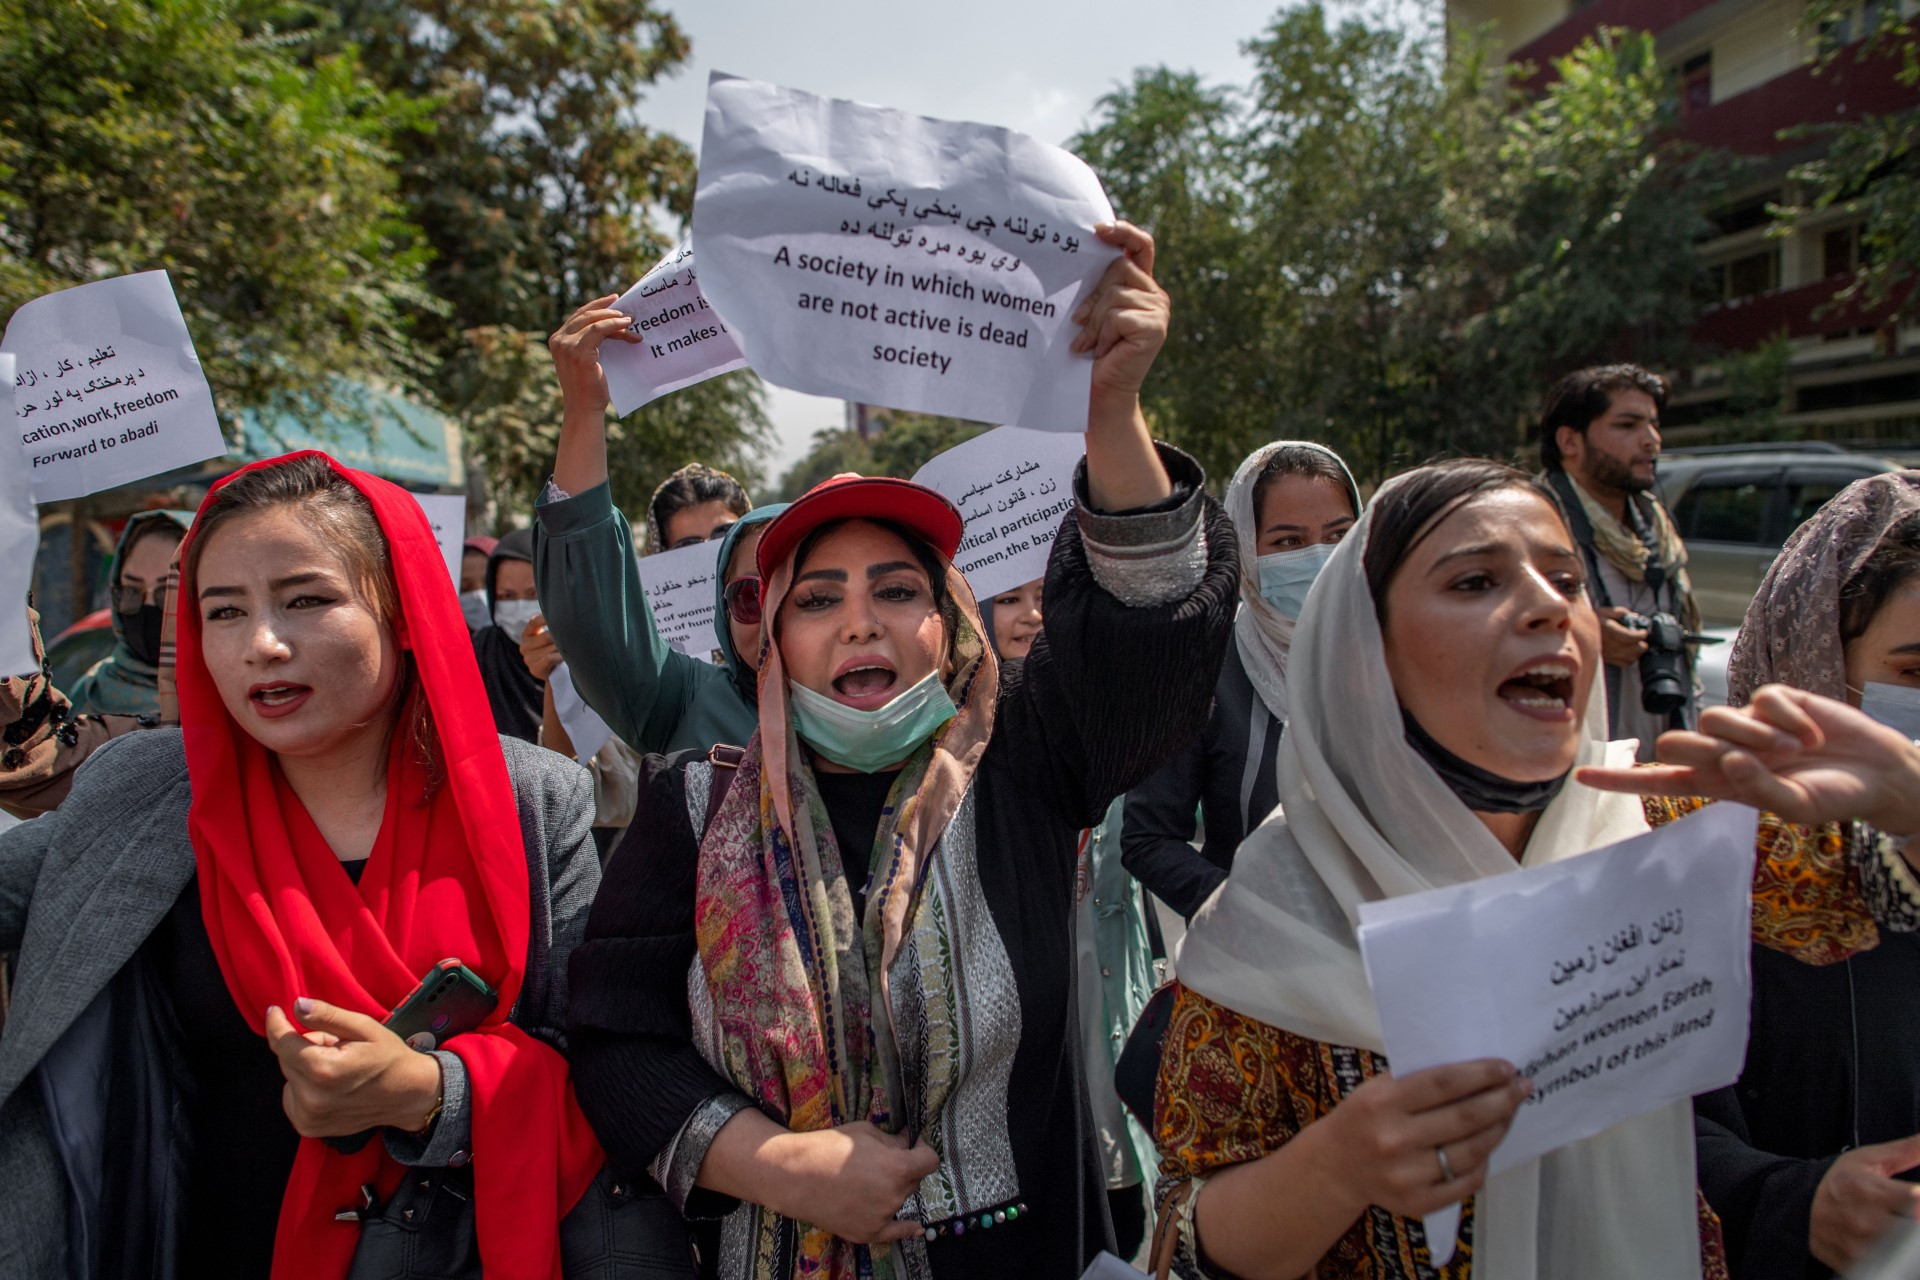 Afghanistan minister won't commit to girls' schooling despite international demand